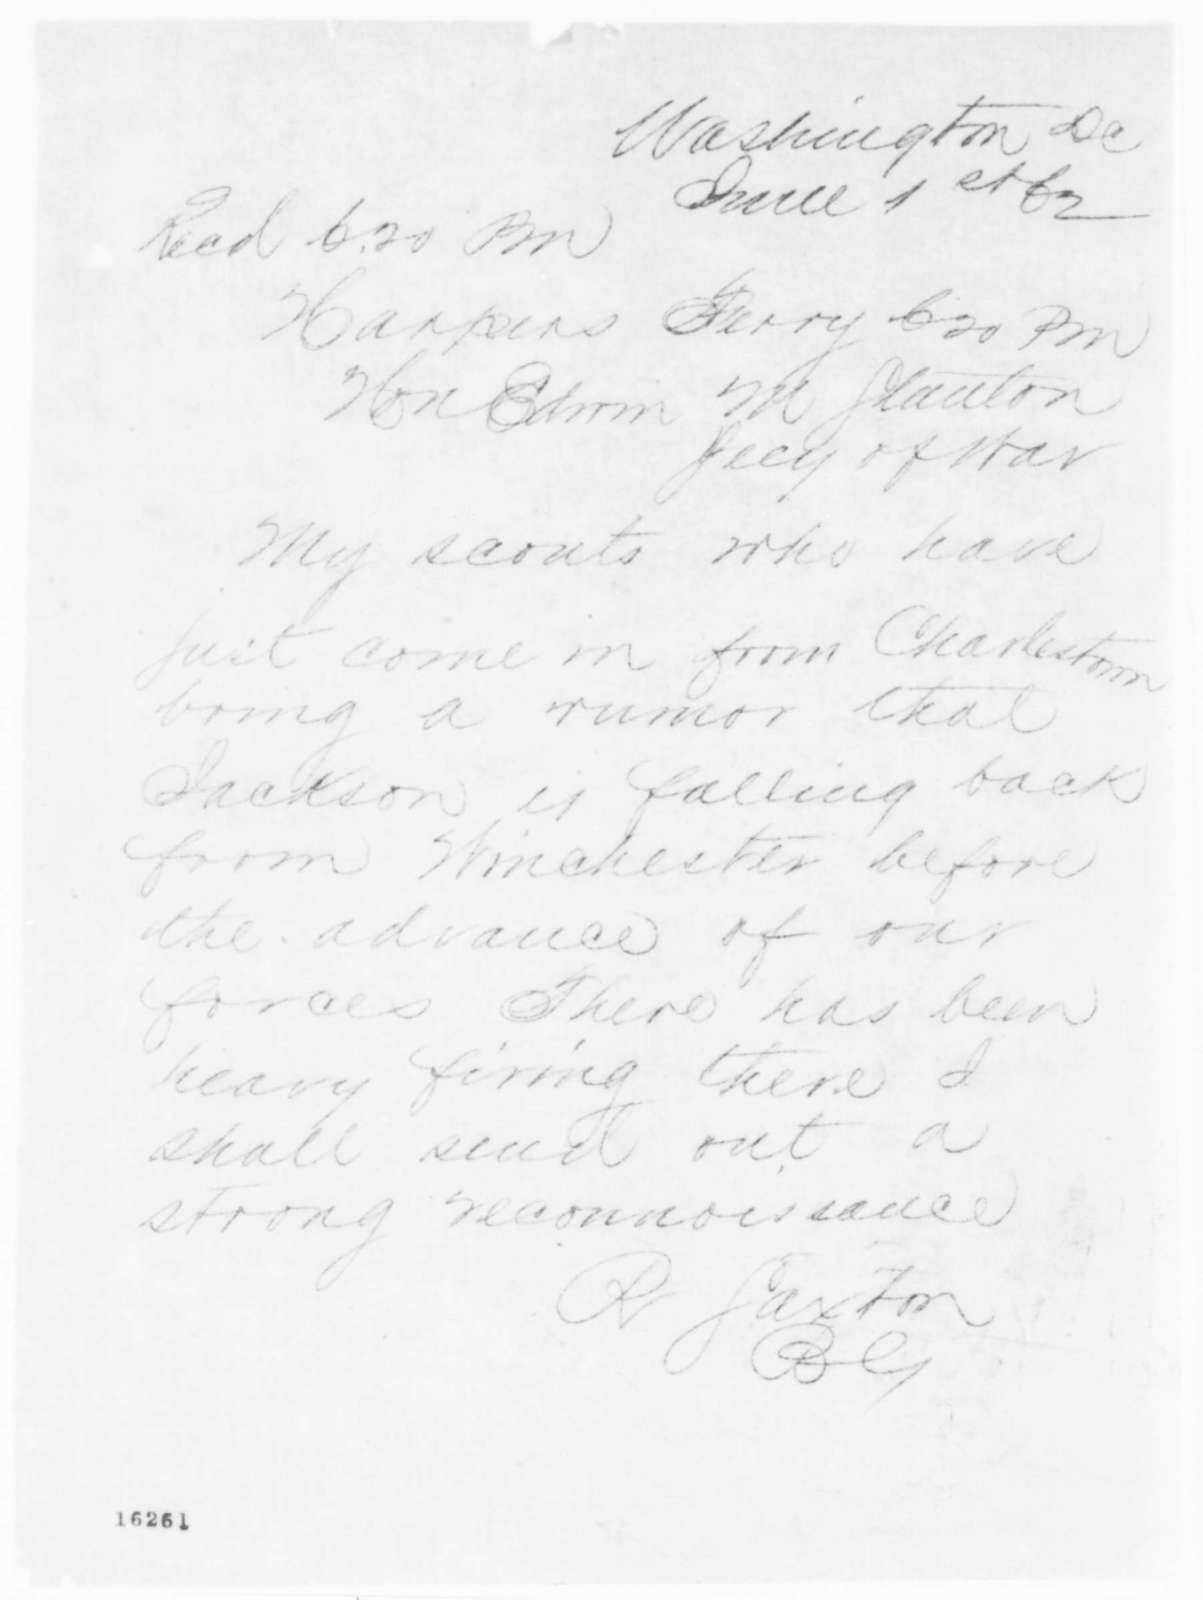 Rufus Saxton to Edwin M. Stanton, Sunday, June 01, 1862  (Telegram regarding military affairs)